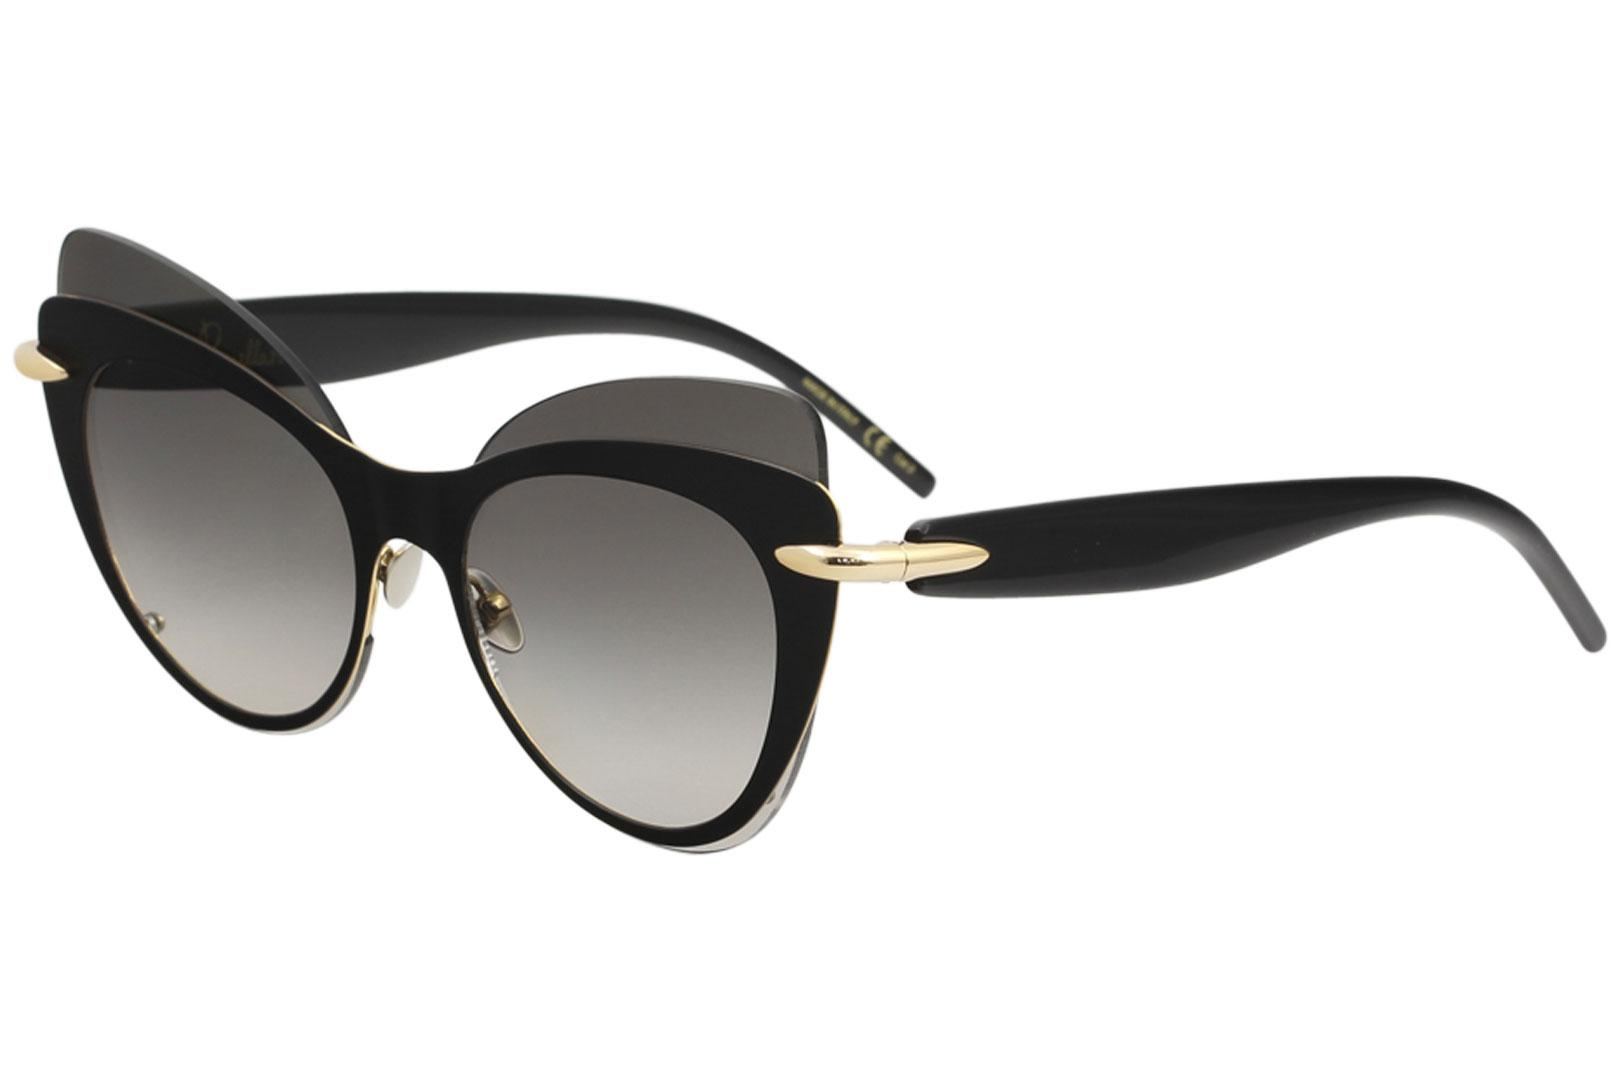 Image of Pomellato Women's Griffe PM0046S PM/0046/S Cat Eye Sunglasses - Black - Lens 60 Bridge 14 Temple 145mm